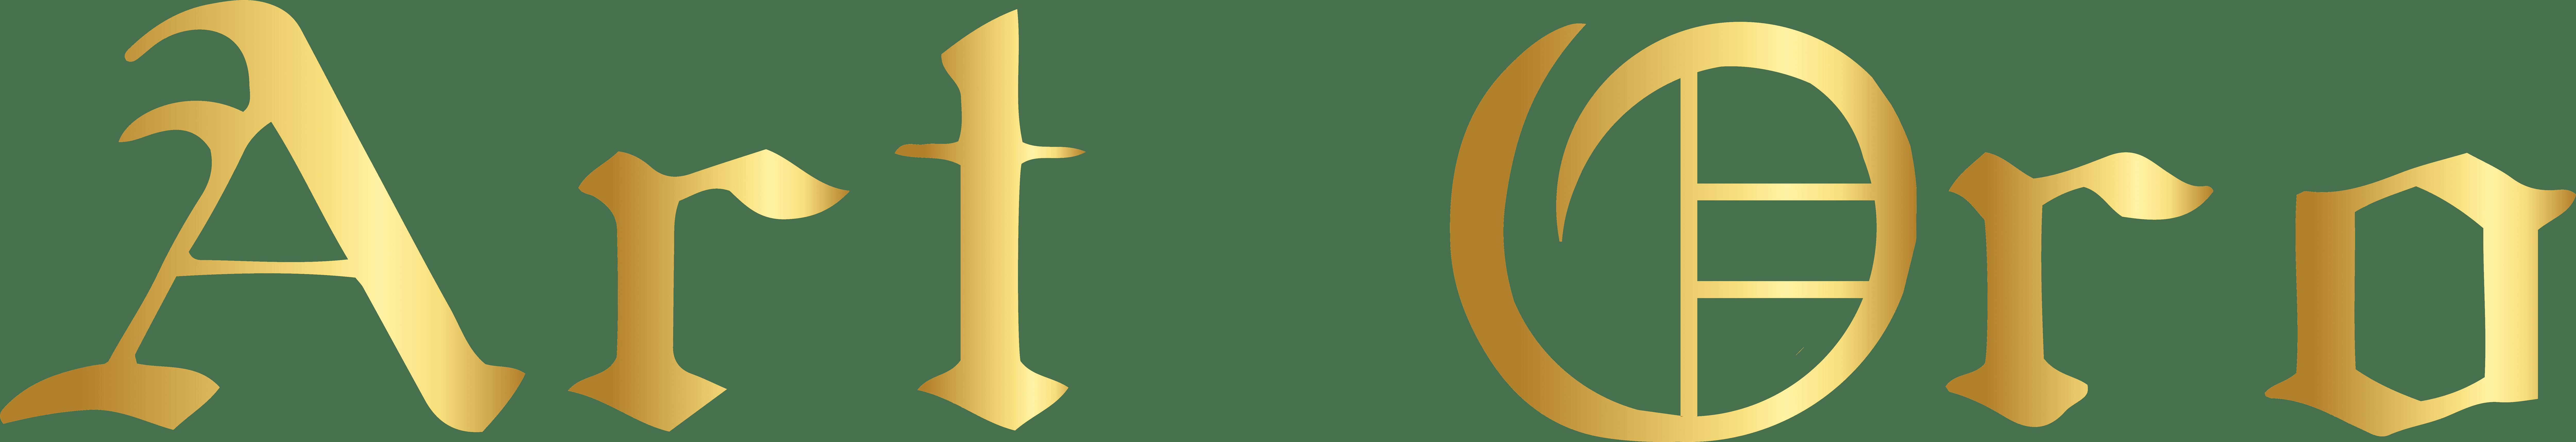 Art Oro Cabiate logo 1